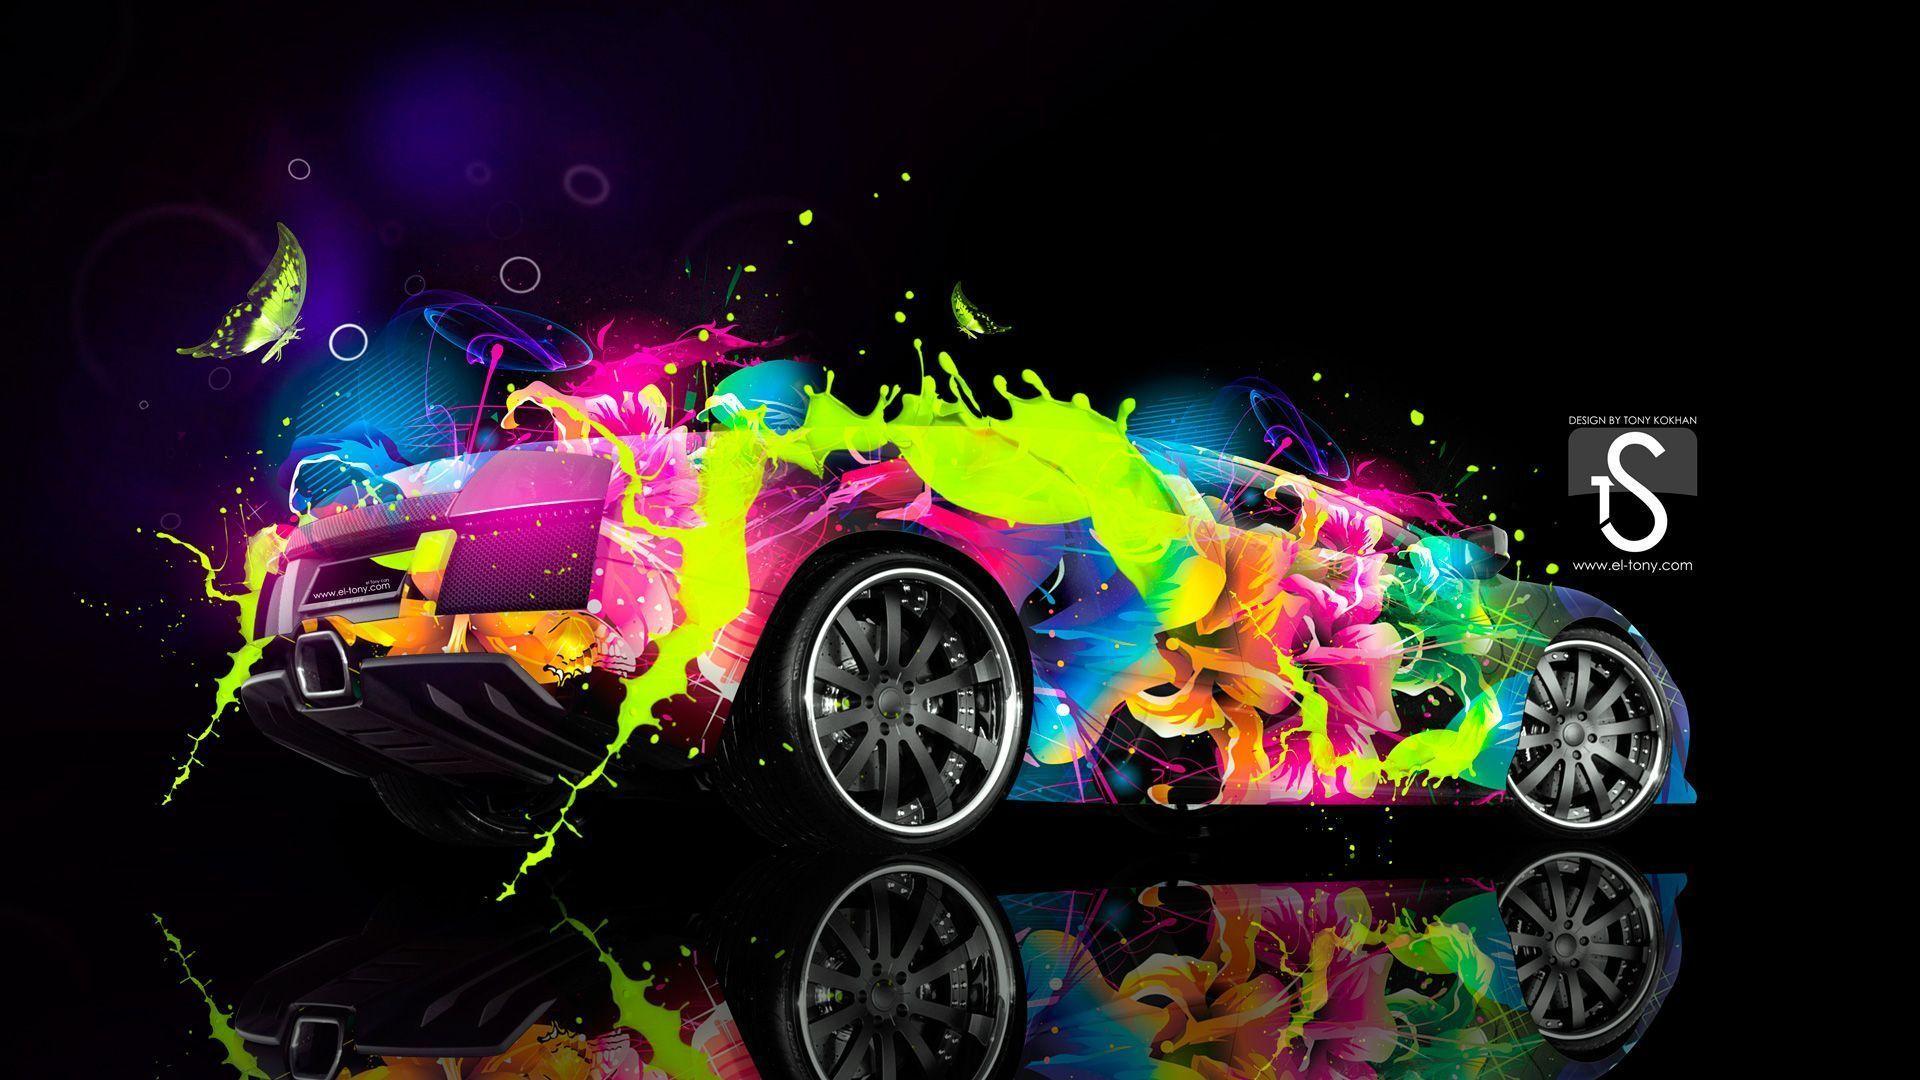 Lamborghini Murcielago Abstract Car 2013 « El Tony